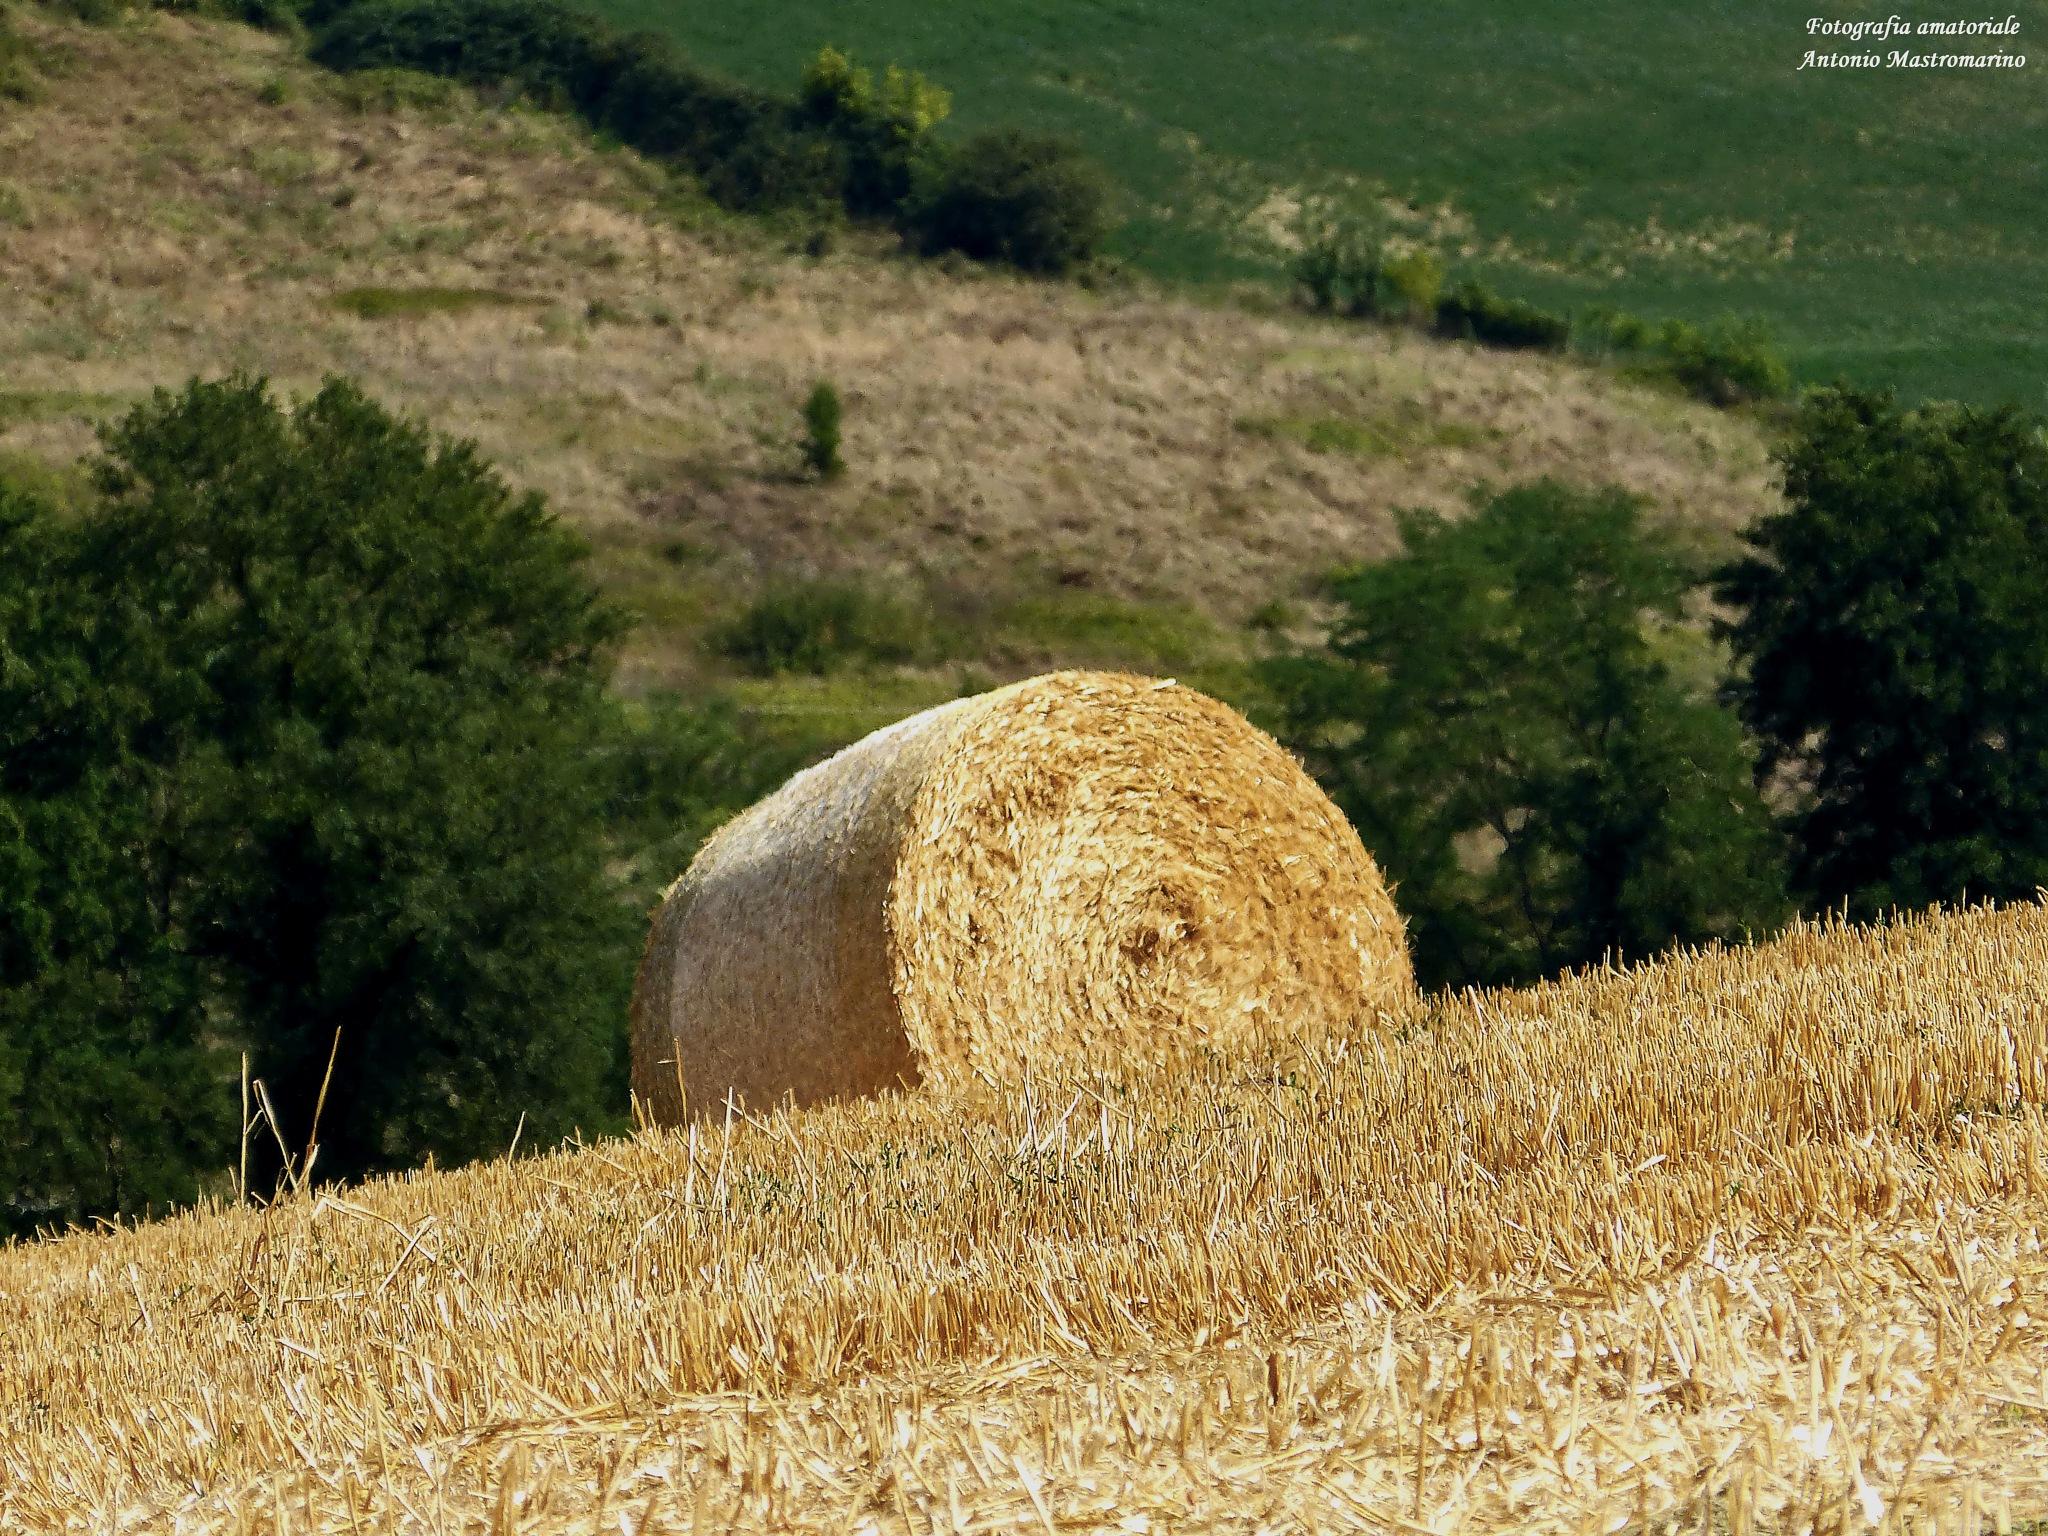 #mugello #grezzano #natura #toscana by antonio mastromarino